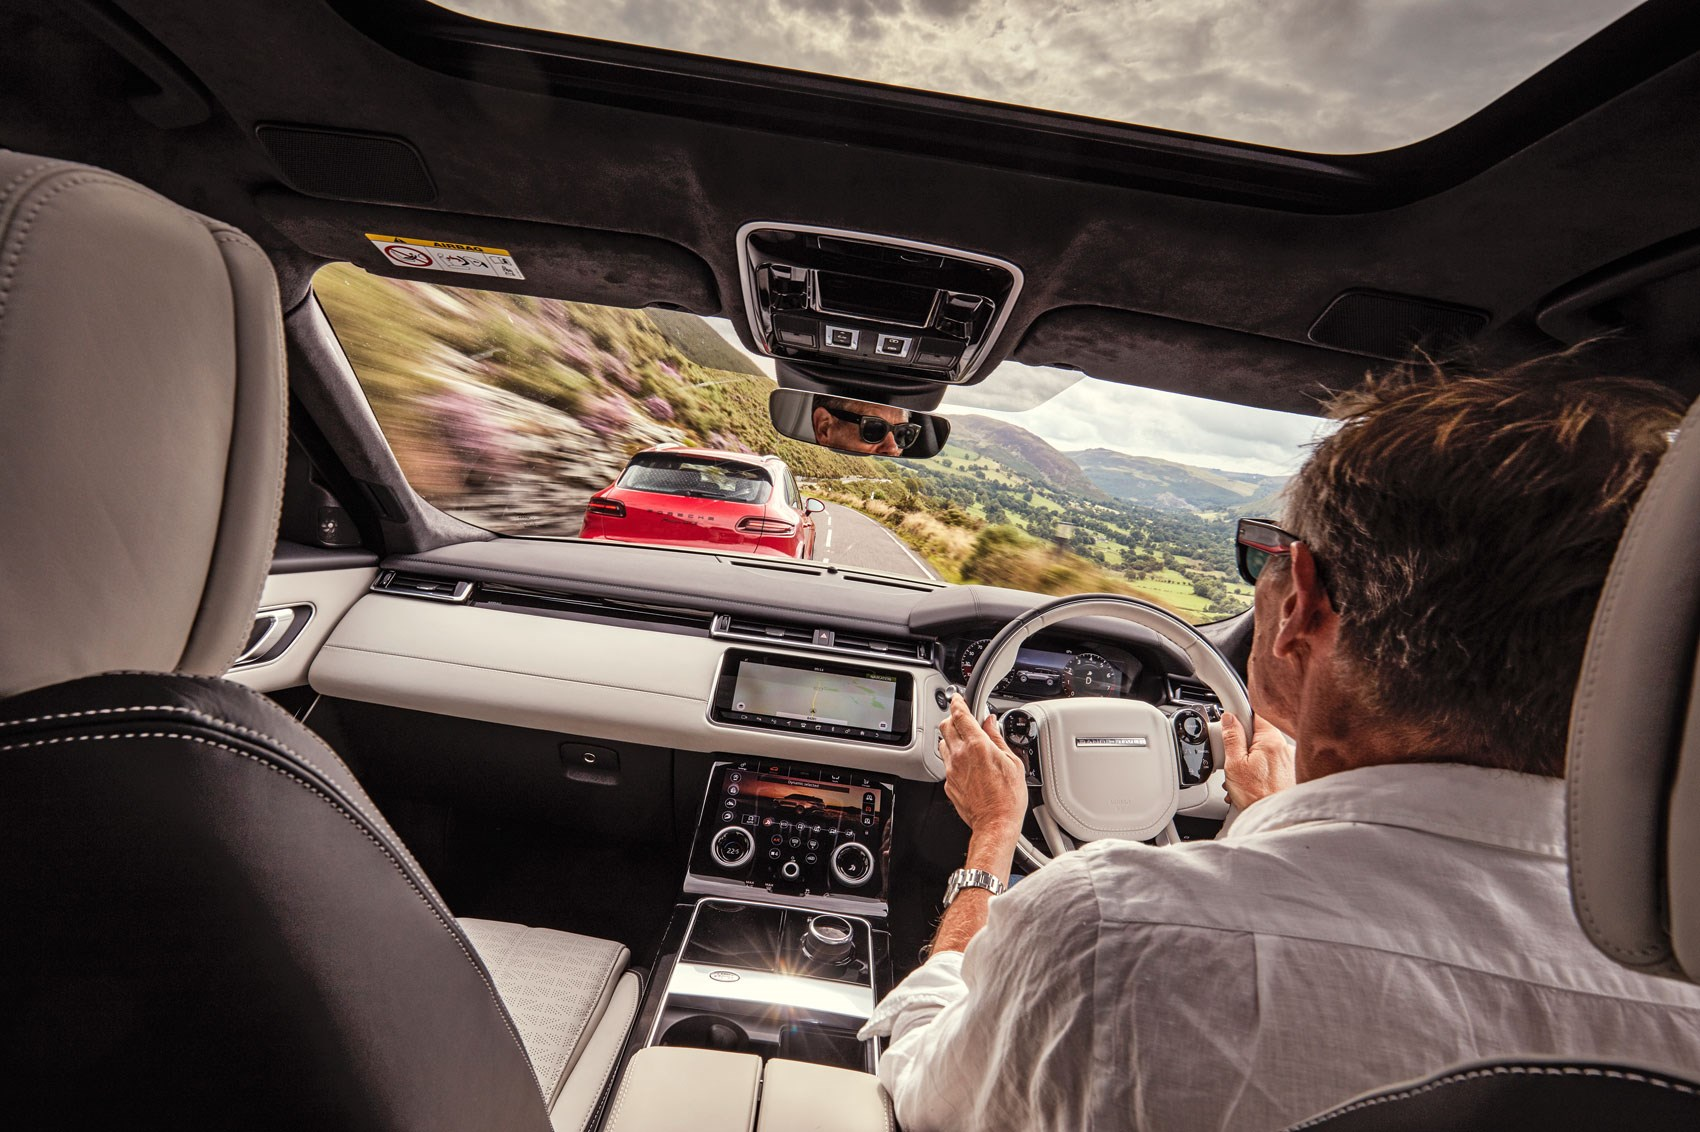 Range Rover Velar Vs Porsche Macan GTS 2017 Twin Test Review